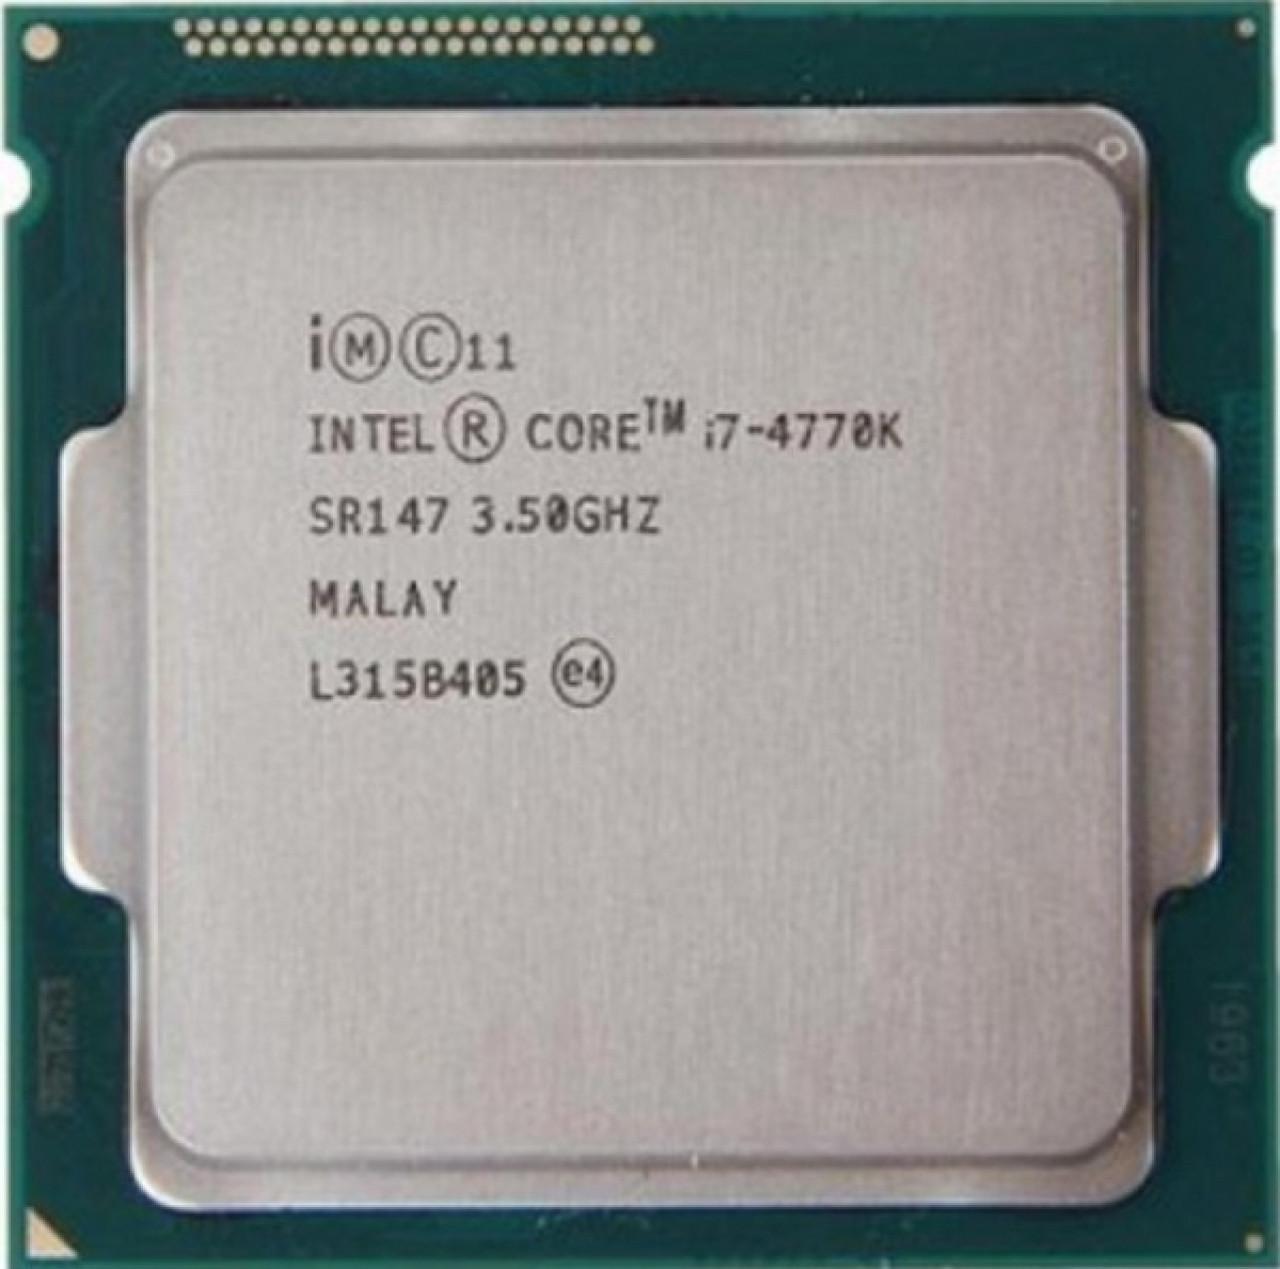 Процессор Intel Core i7-4770K BX80646I74770K 3.5GHz Socket 1150 Tray Б/У